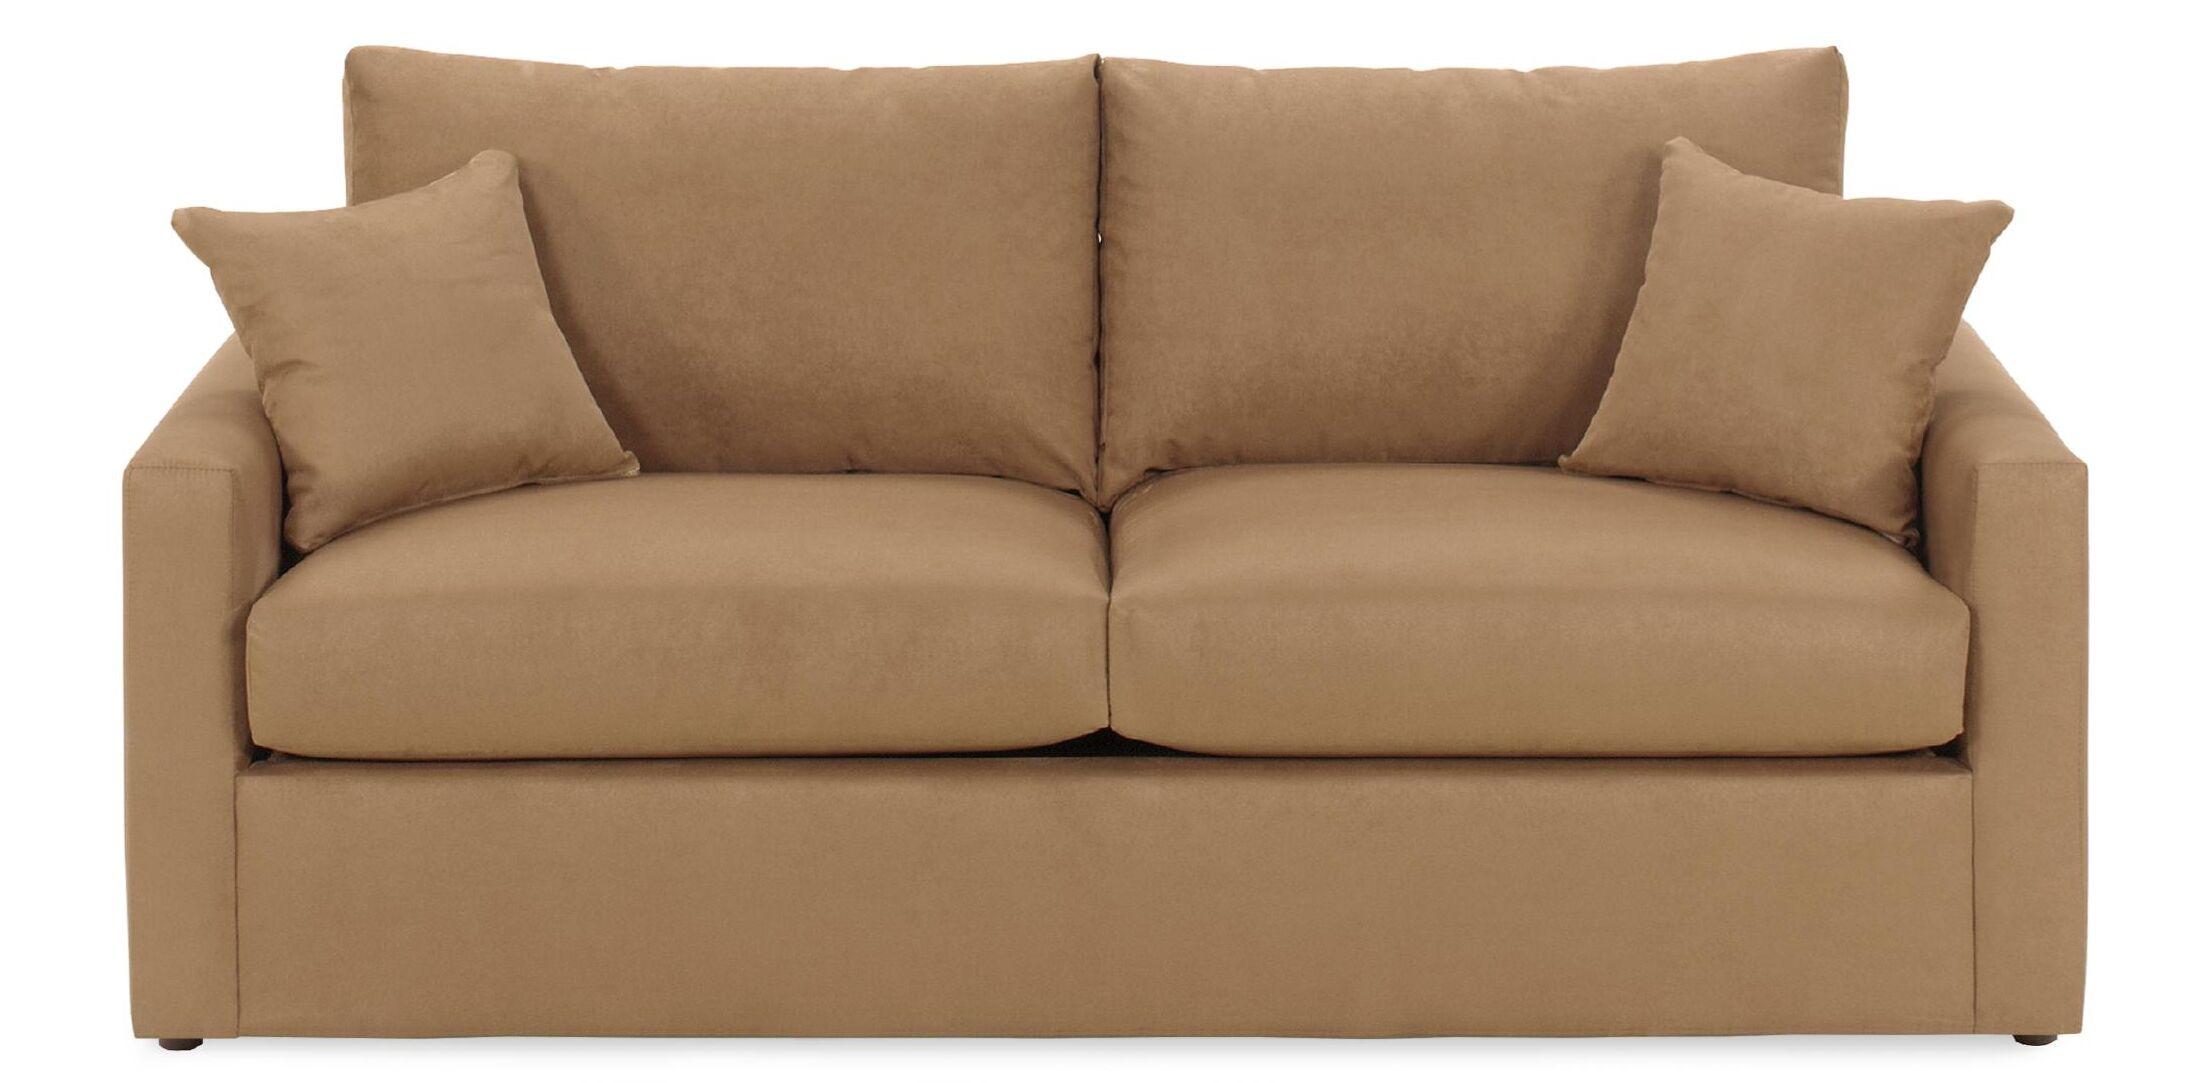 Ardencroft Sleeper Sofa Upholstery: Obsessions Java, Size: Full, Mattress Type: Memory Foam